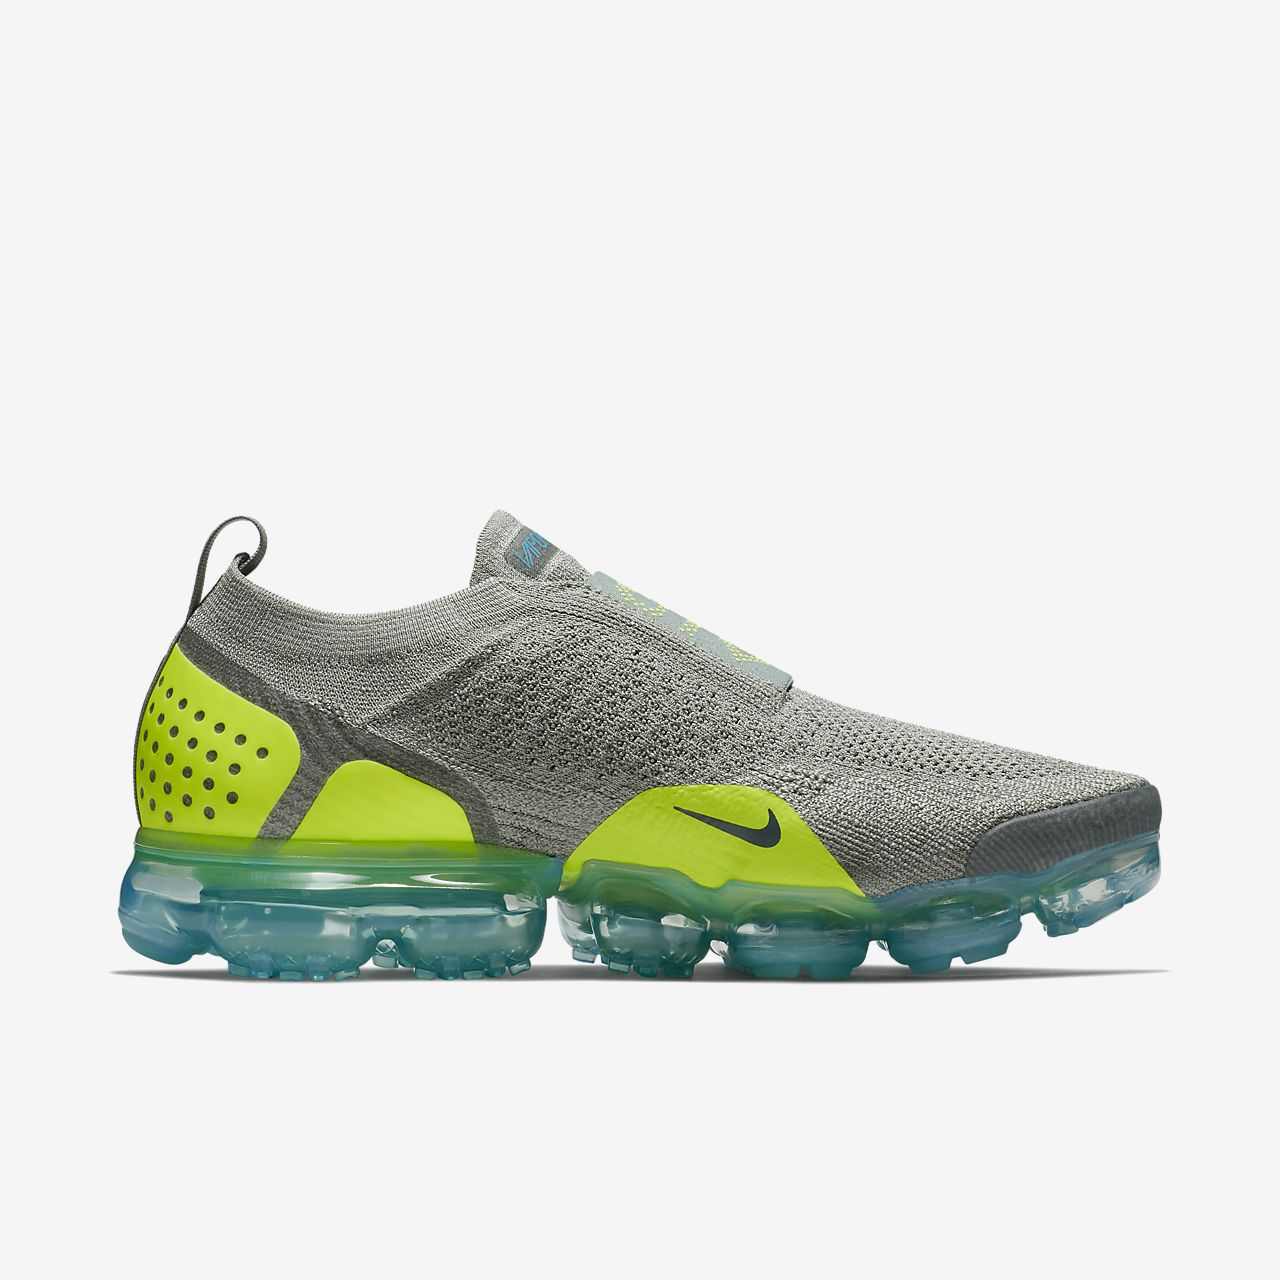 Precio Zapatillas Skate Nike,Nike Air VaporMax Flyknit Moc 2